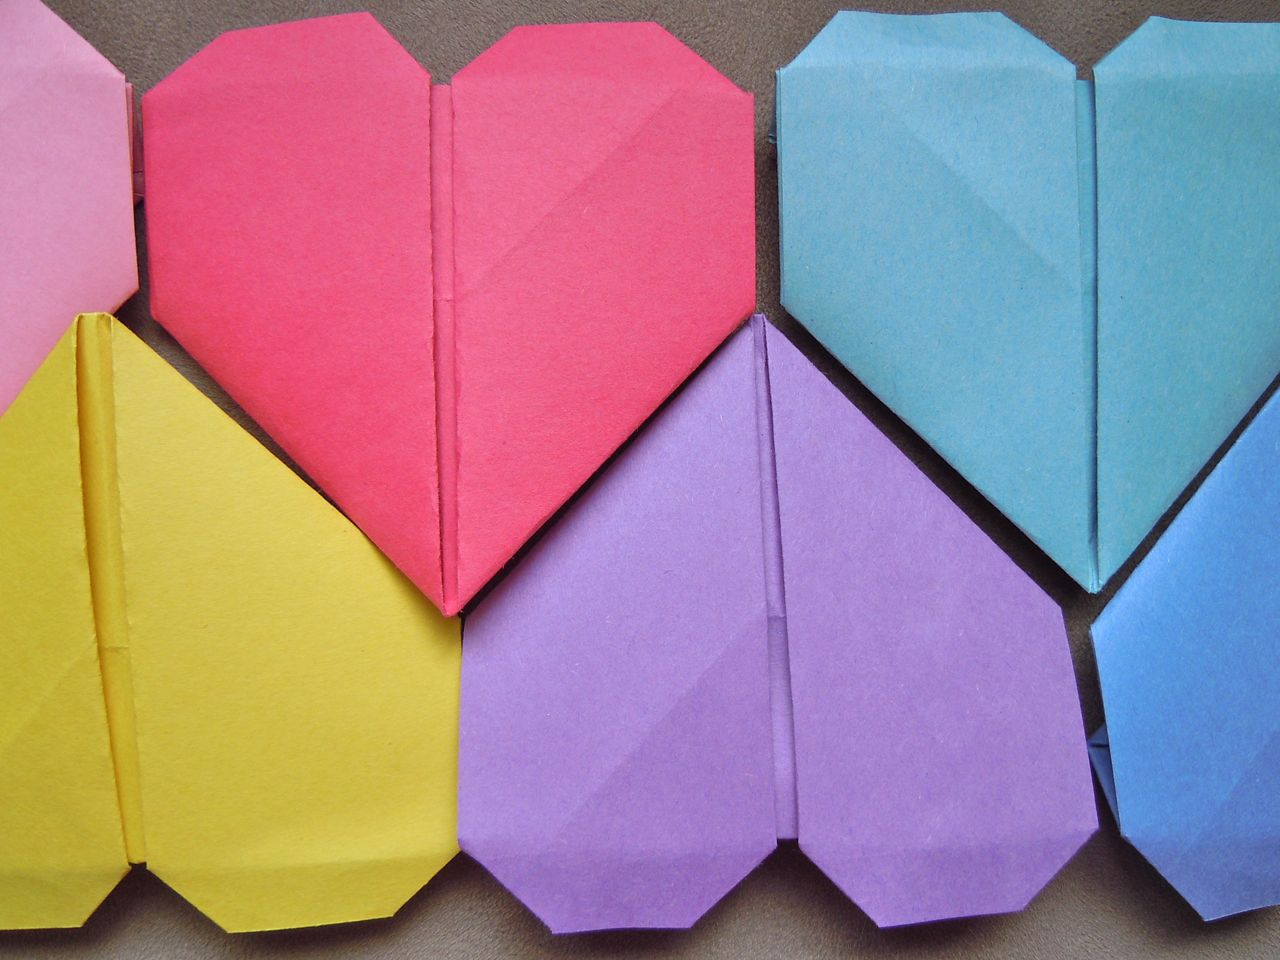 Pin Origami-heart on Pinterest - photo#17